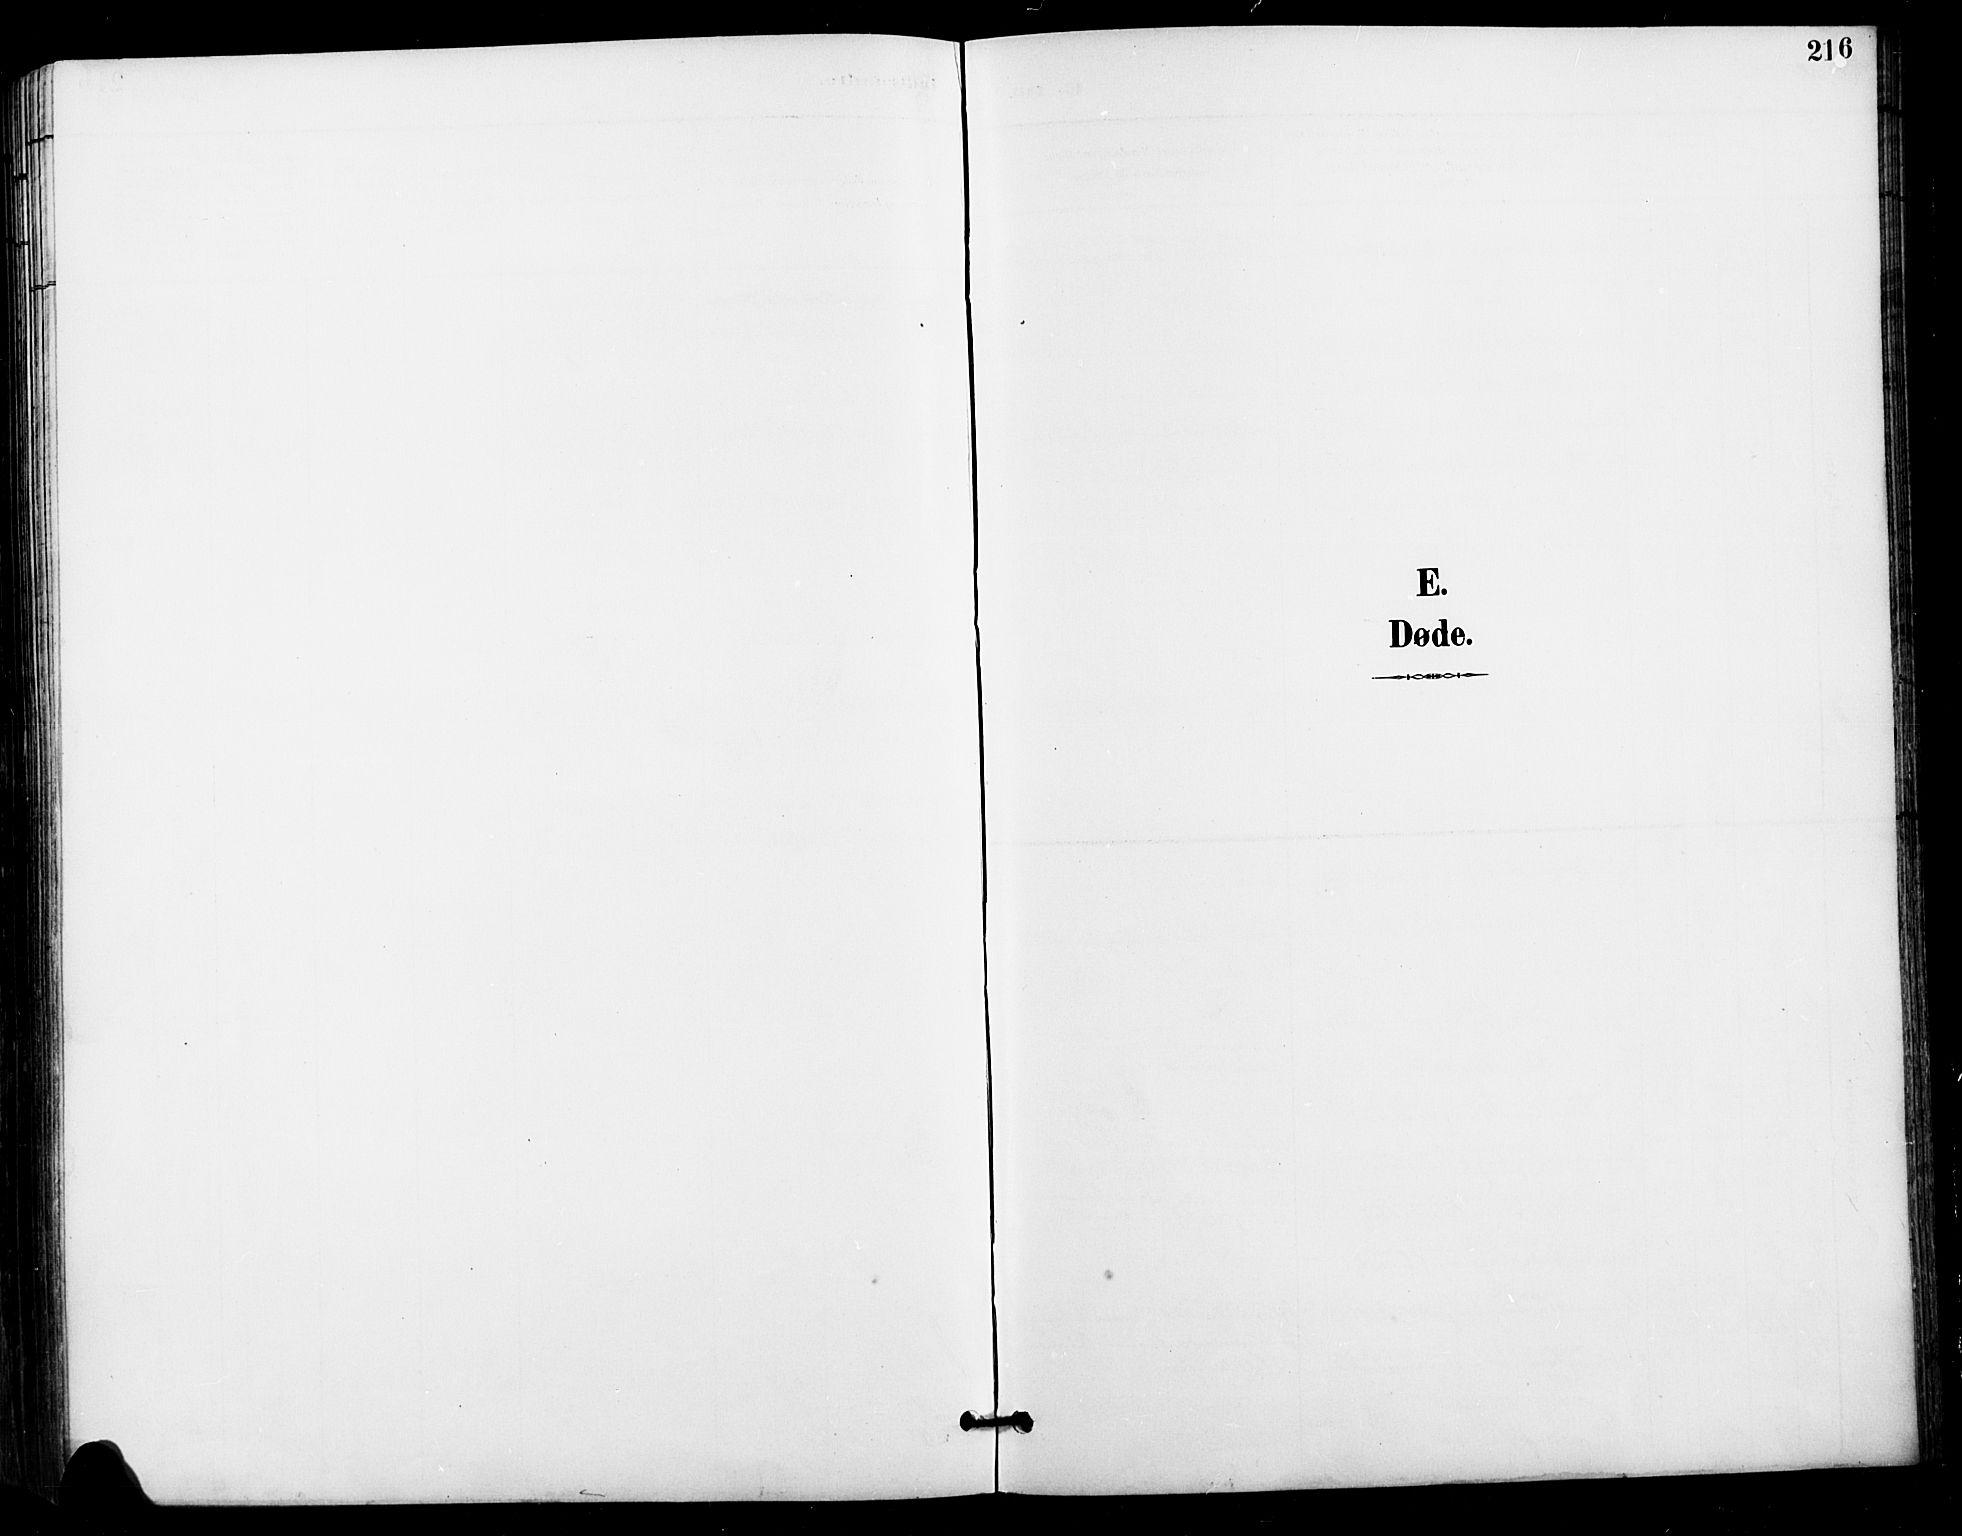 SAH, Vestre Gausdal prestekontor, Klokkerbok nr. 3, 1896-1925, s. 216